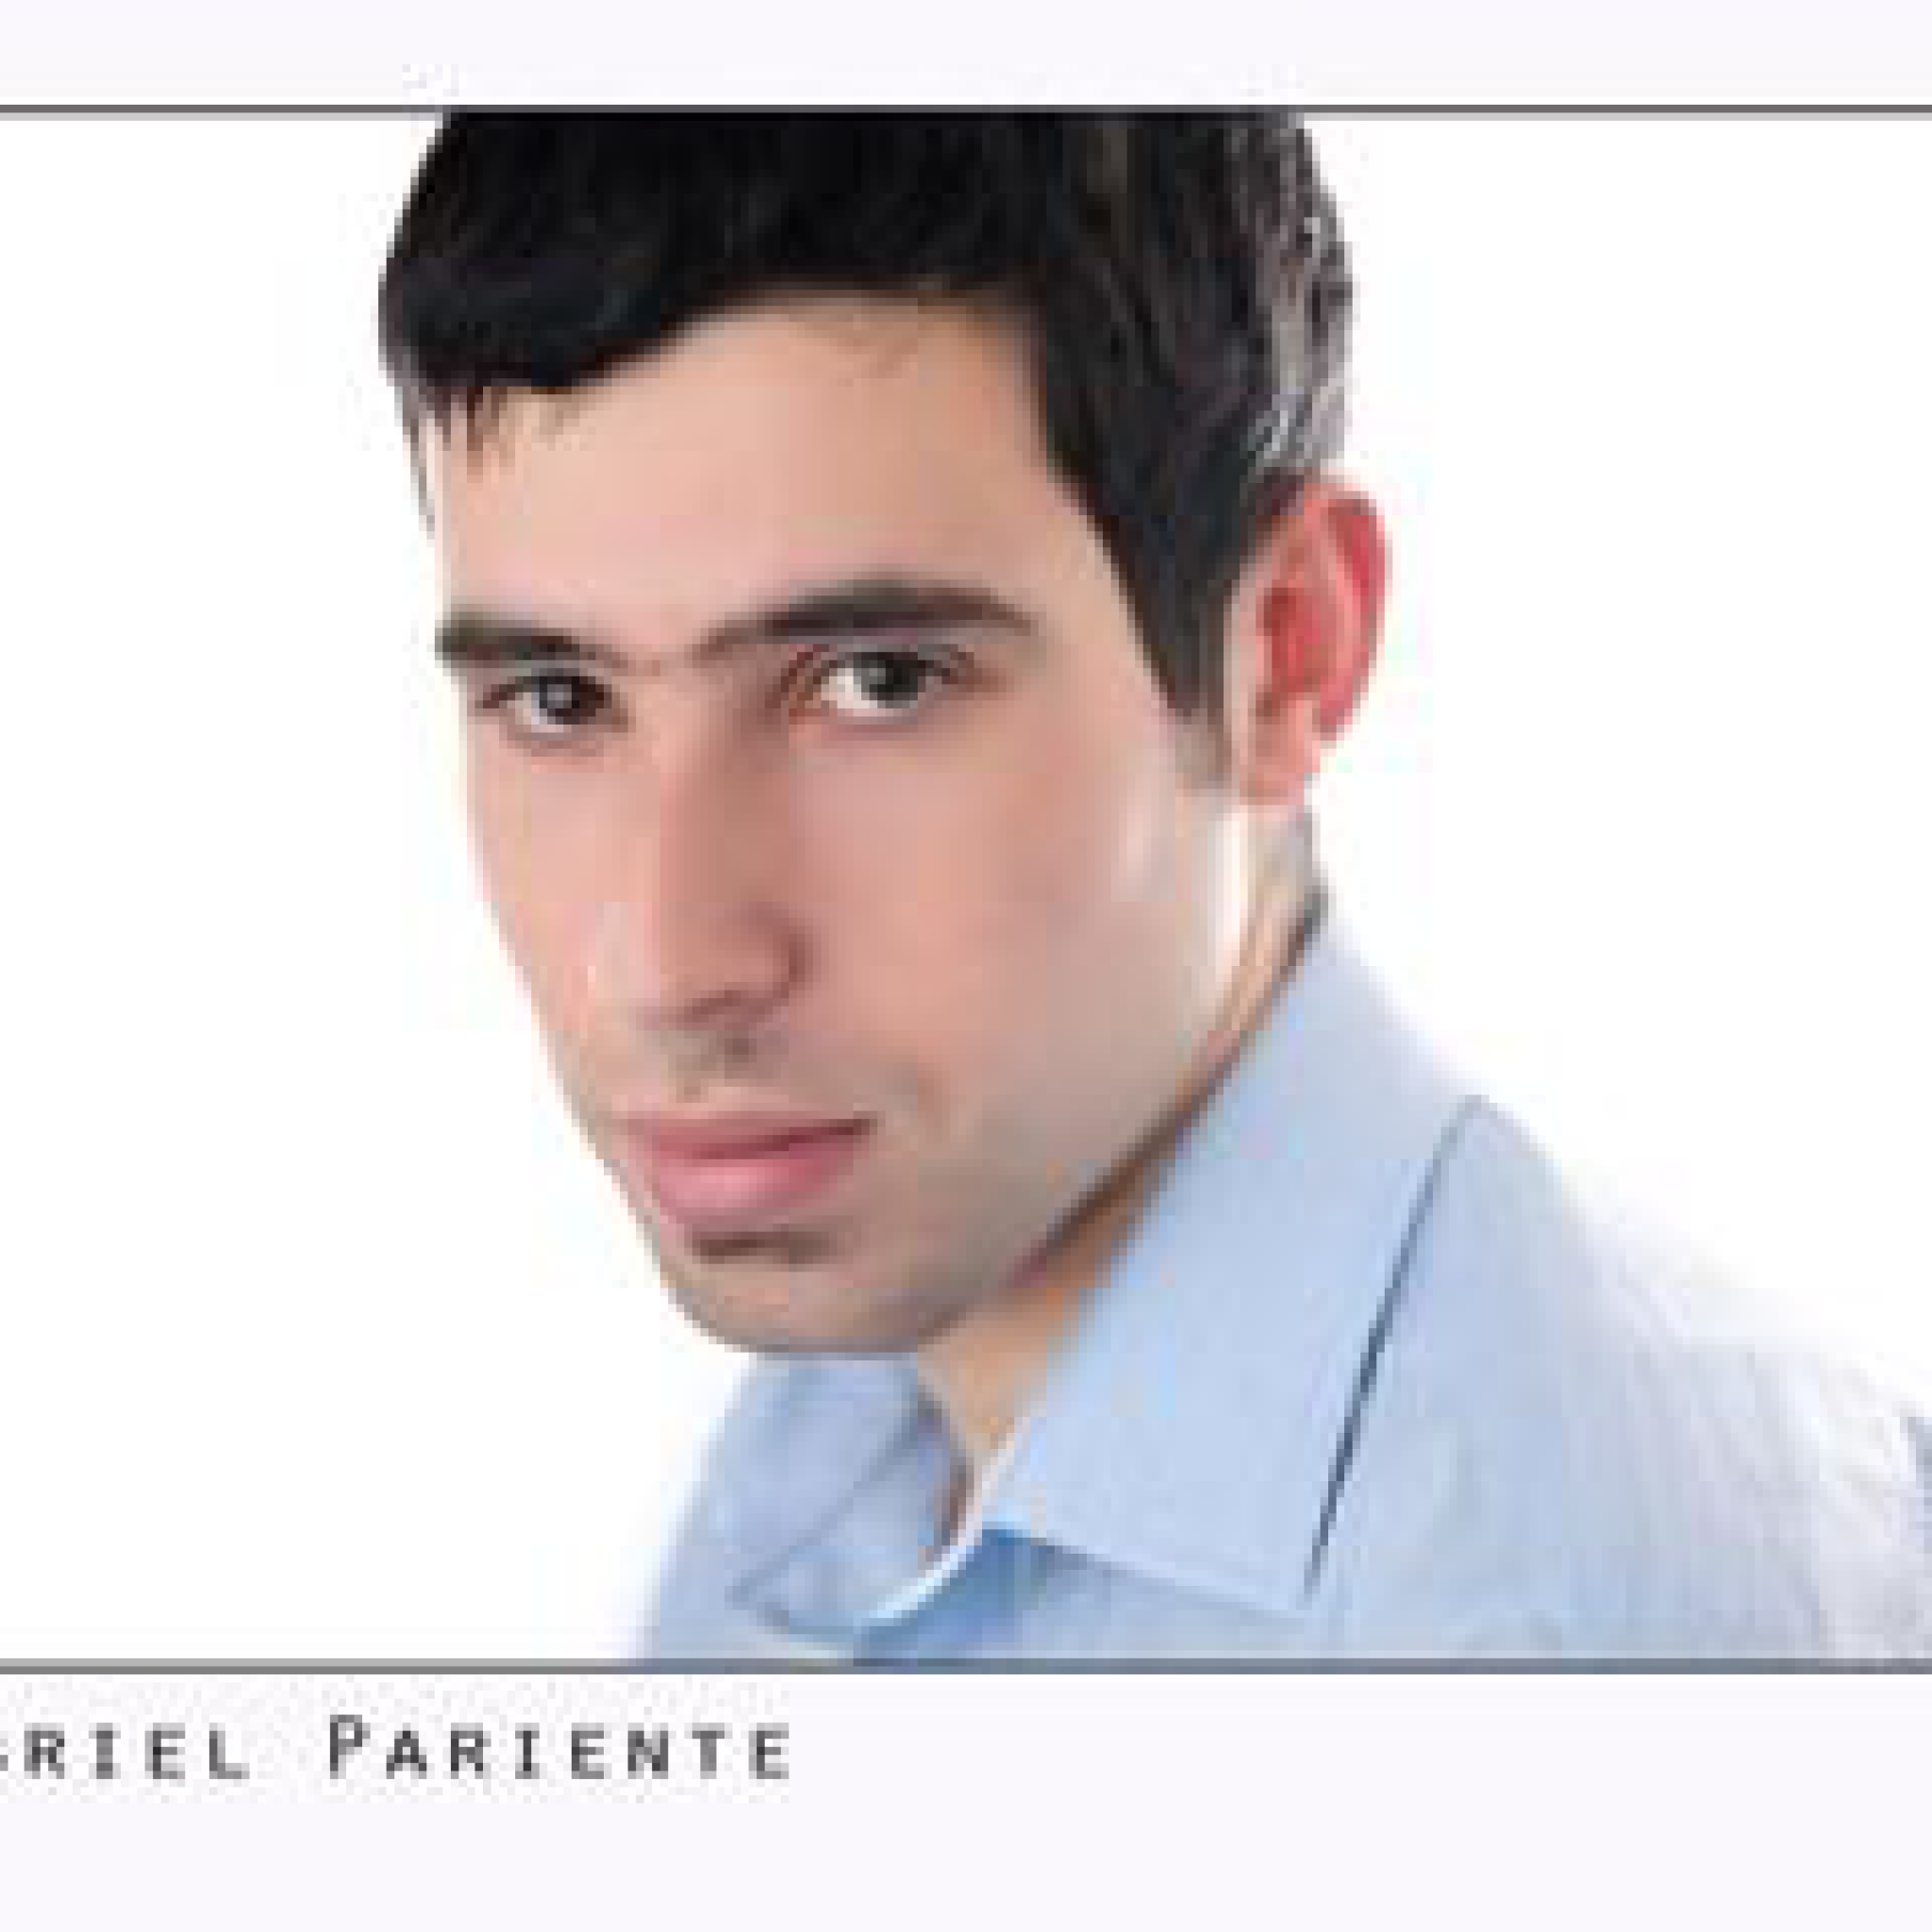 Gabriel Pariente